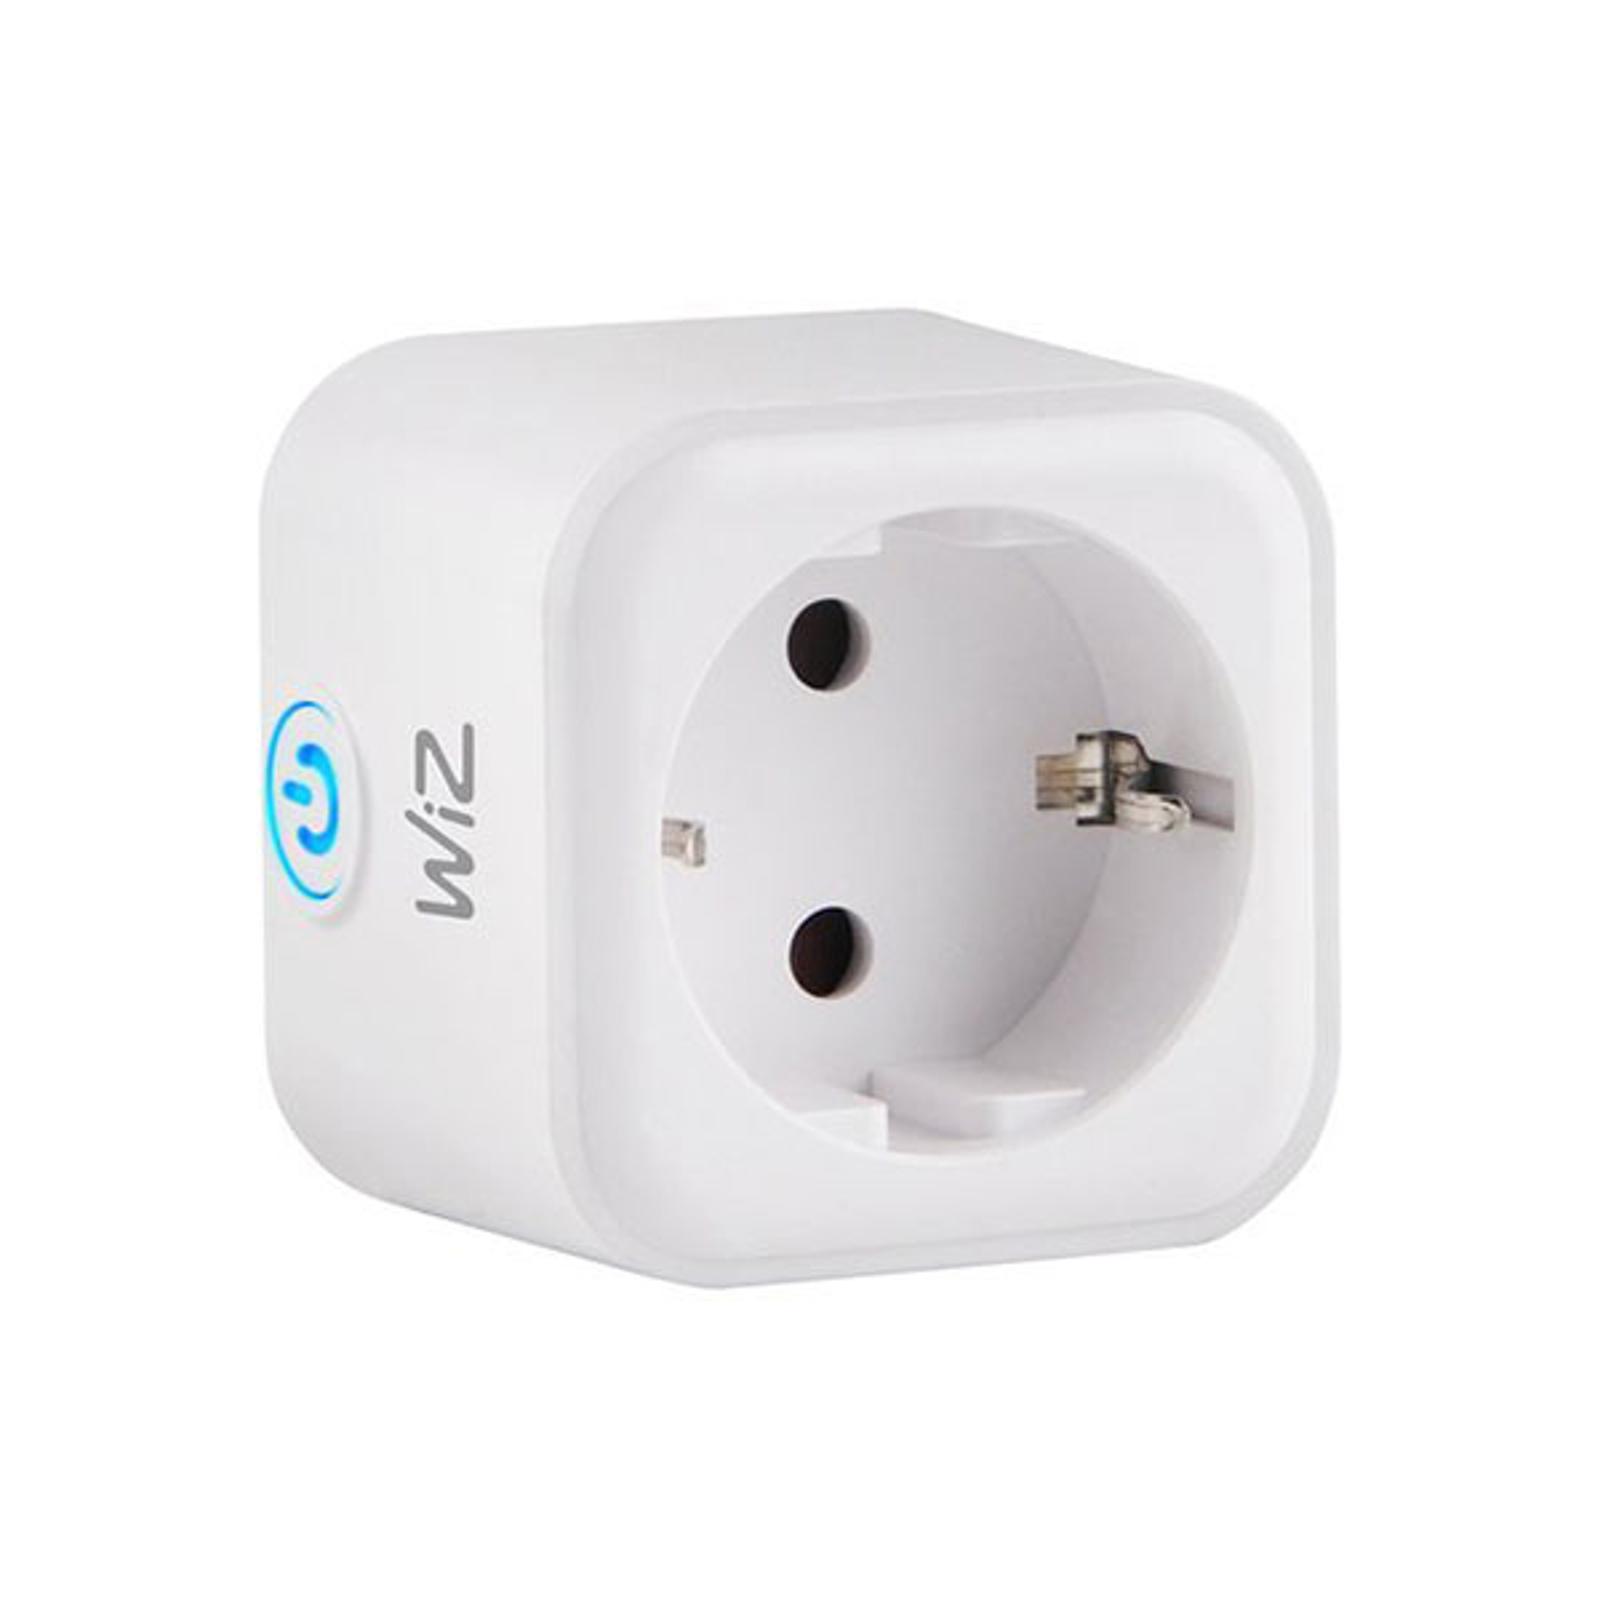 WiZ Smart Plug Steckdosenstecker